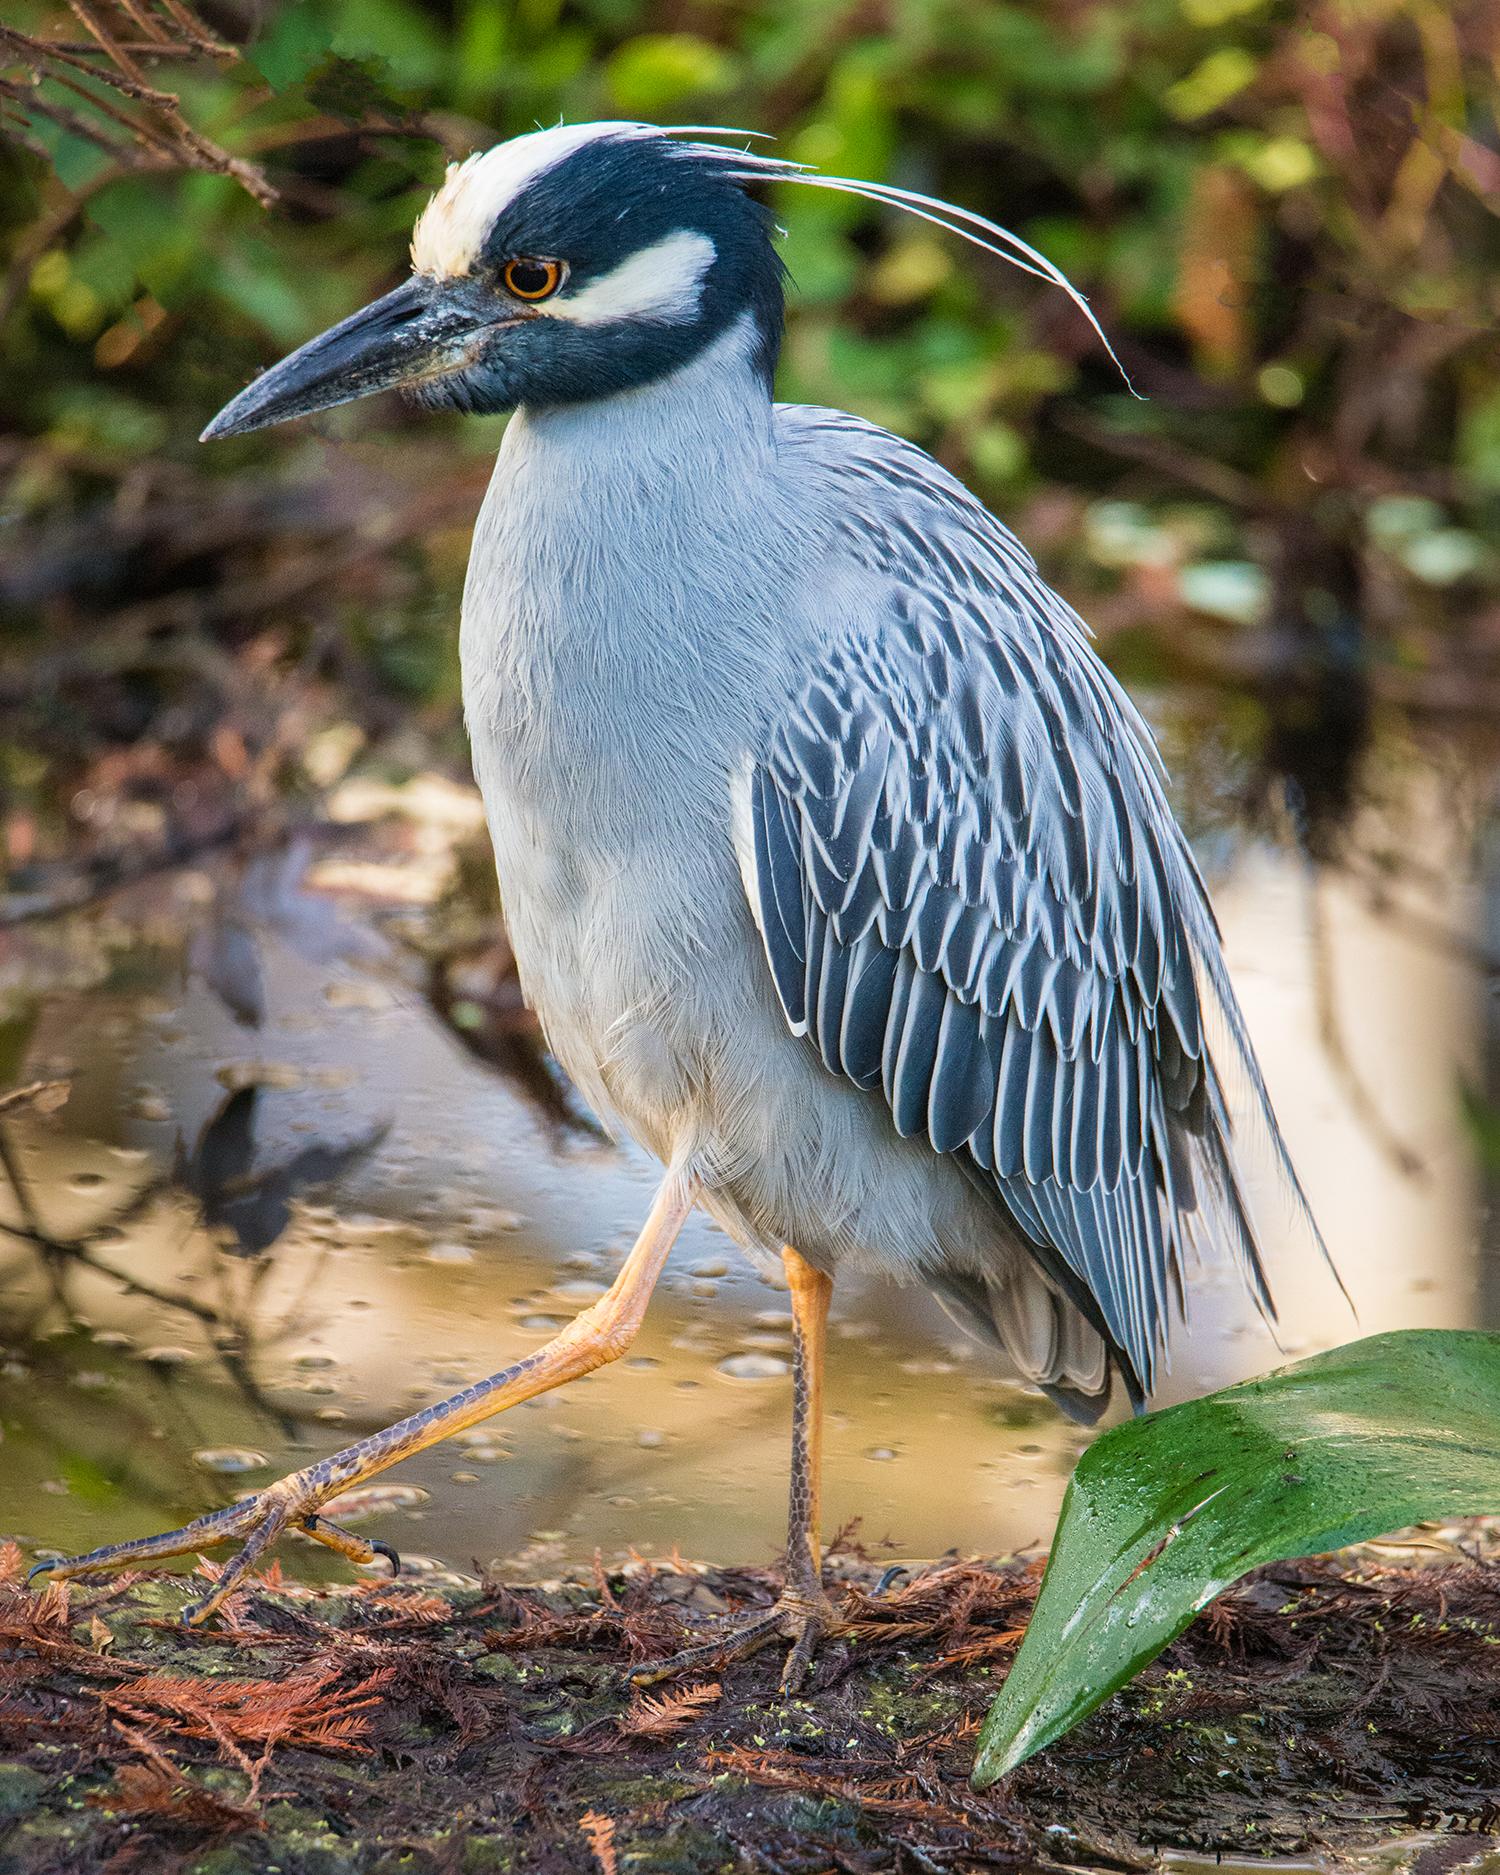 #nightheron, #yellowcrownednightheron, #heron, #bird, #florida, #naples, #Corkscrew, #birdphotography